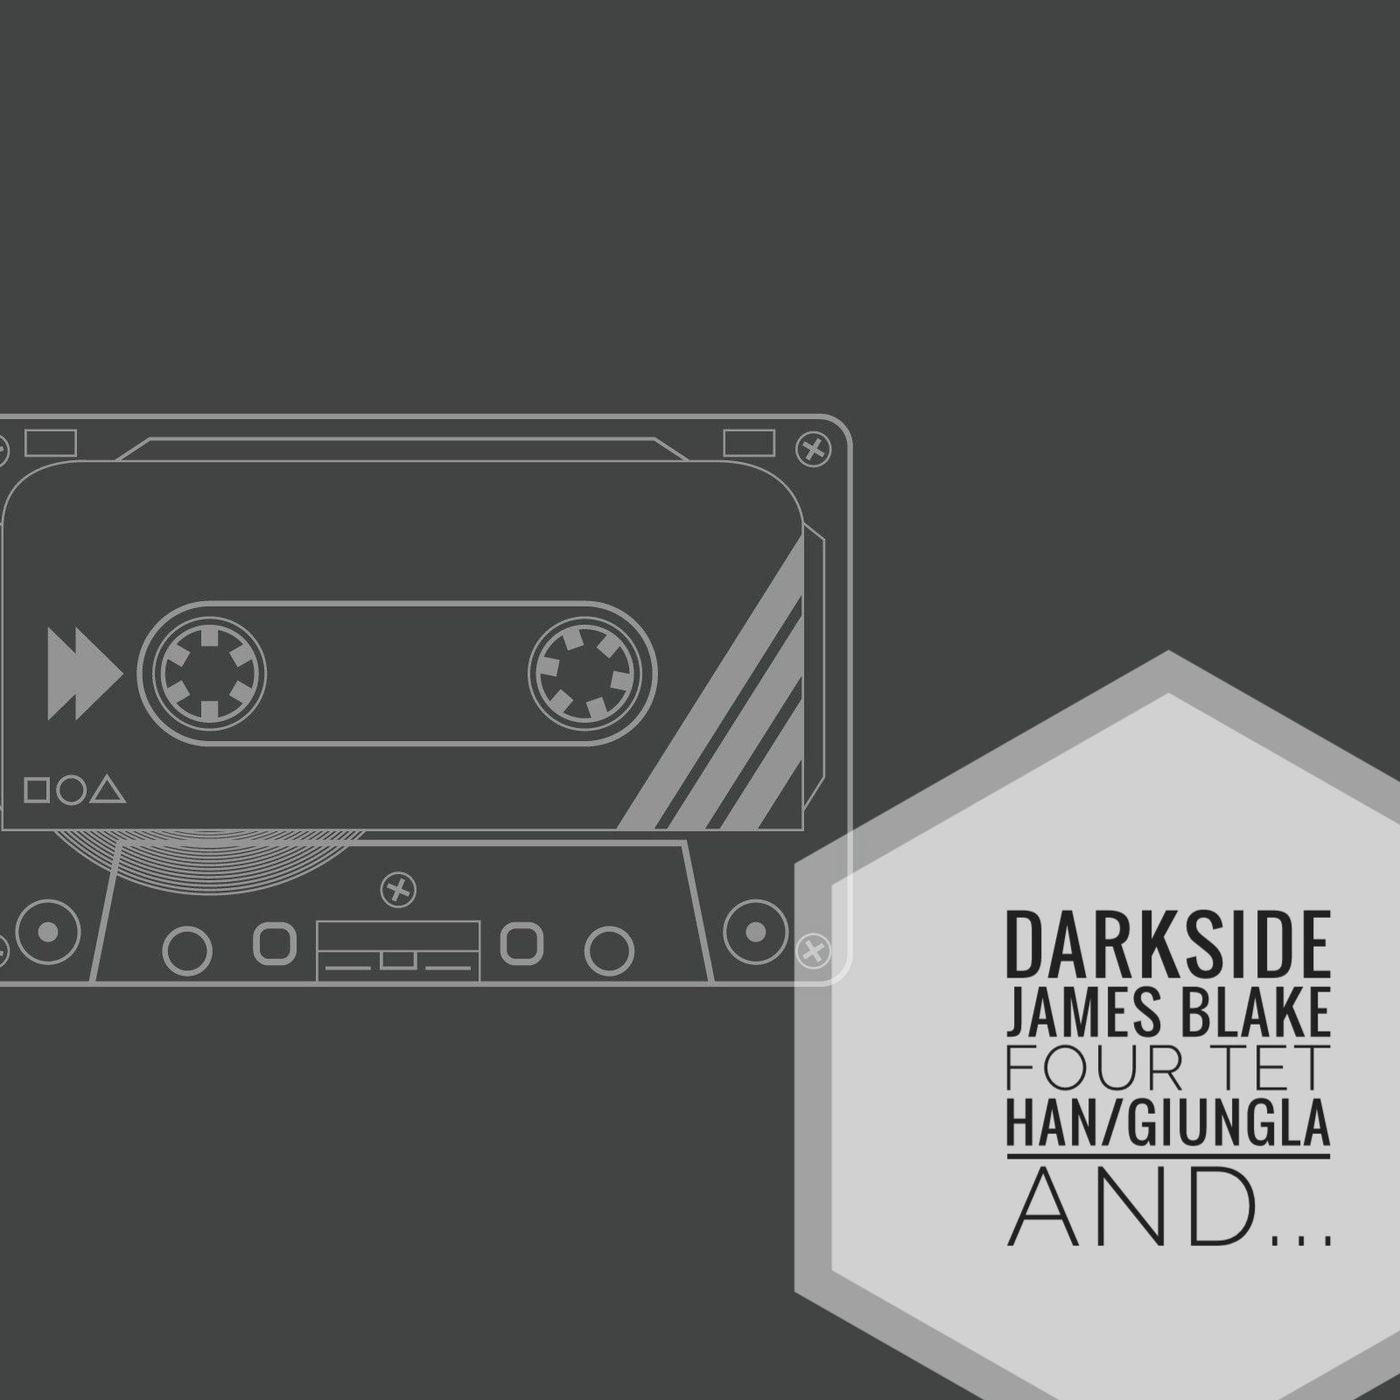 Darkside, James Blake, Four Tet, Han/Giungla... + [Videogiochi] Cyberpunk 2077 - Propaganda - s04e15